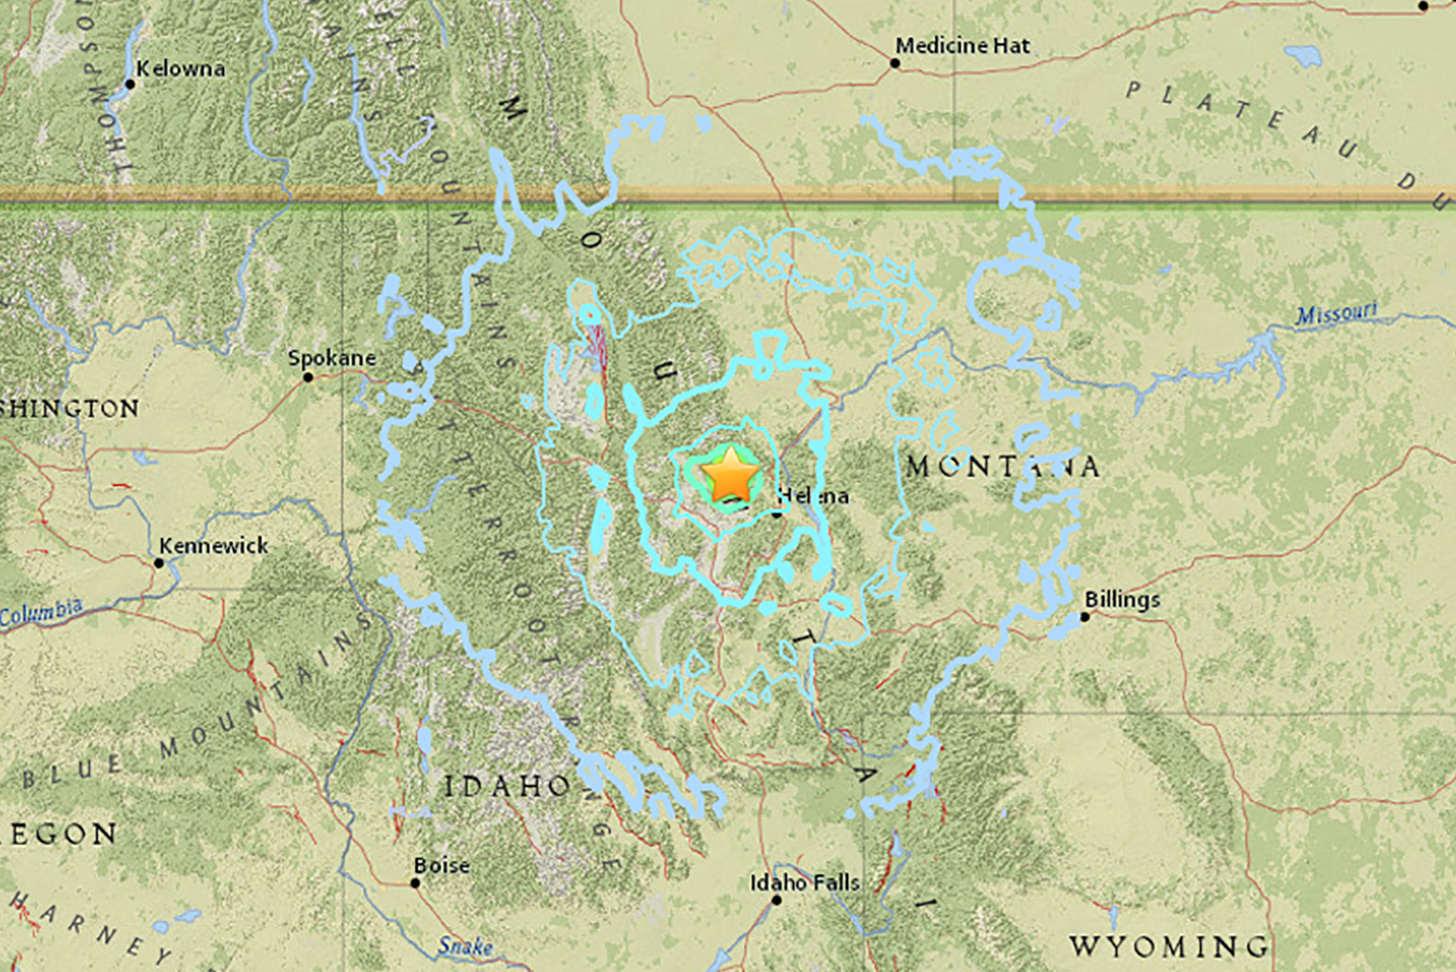 Montana Earthquake Map